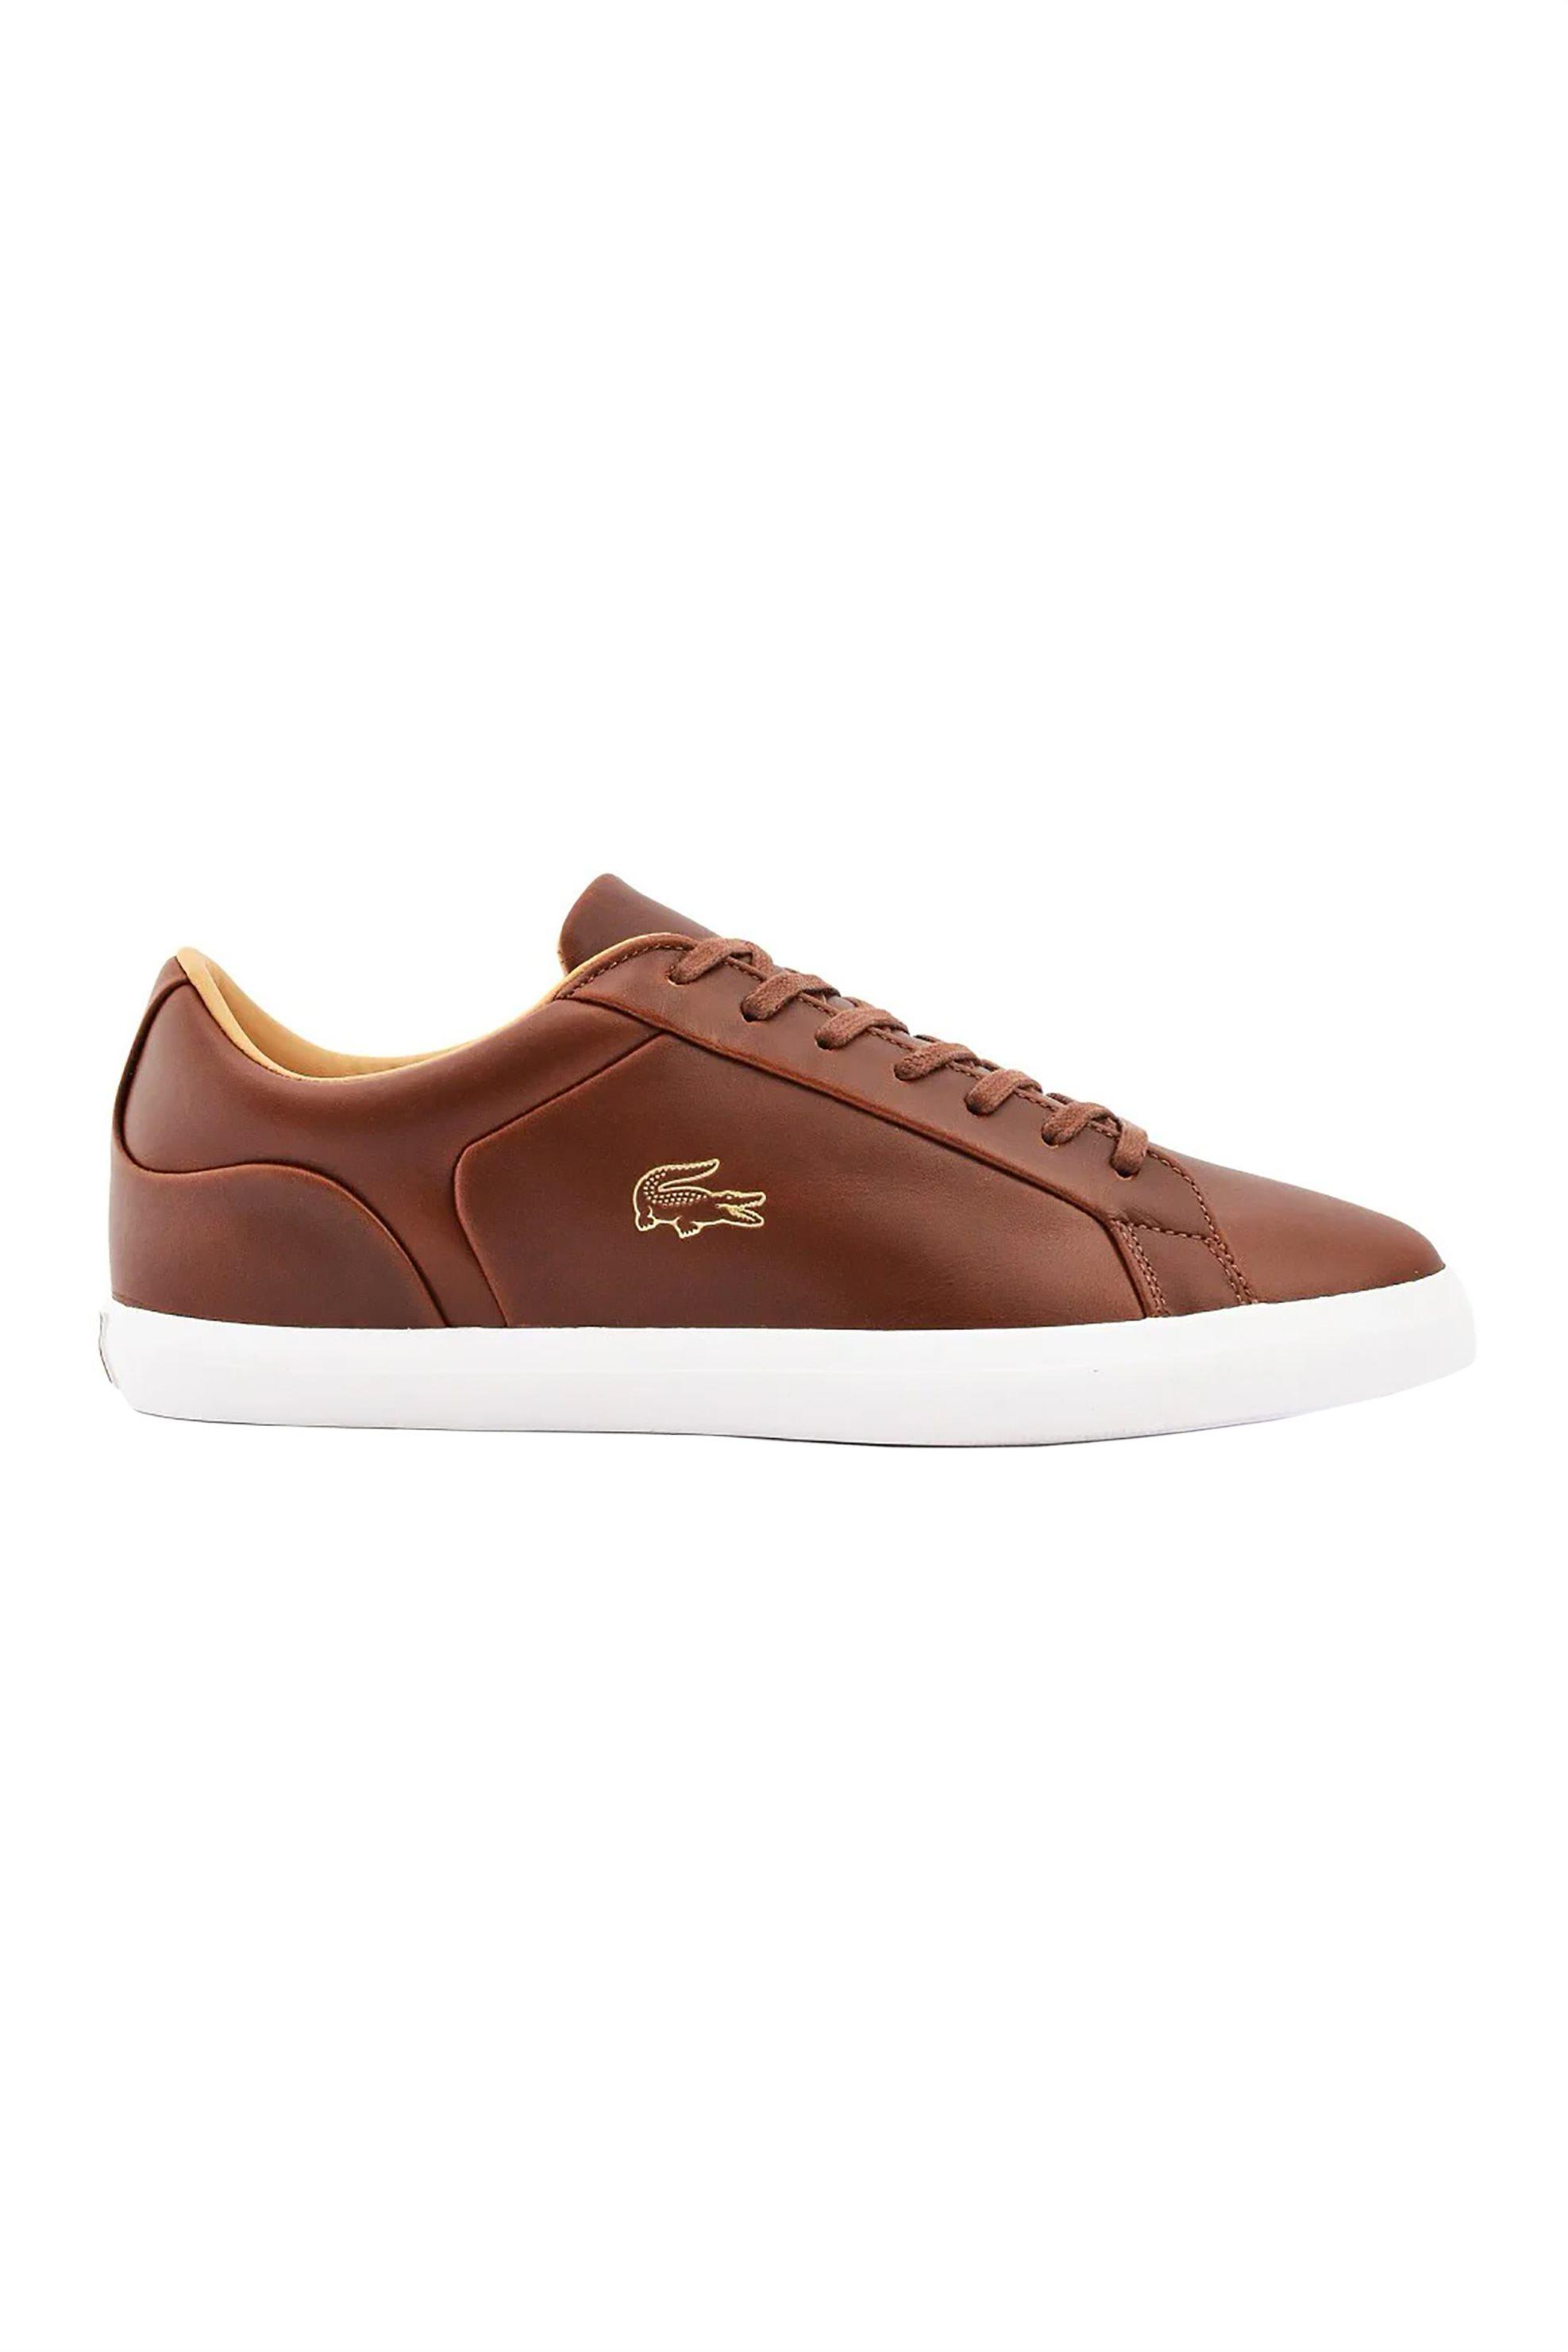 "Lacoste ανδρικα sneakers με χρυσό λογοτυπο ""Lerond"" – 40CMA0012B18 – Ταμπά"